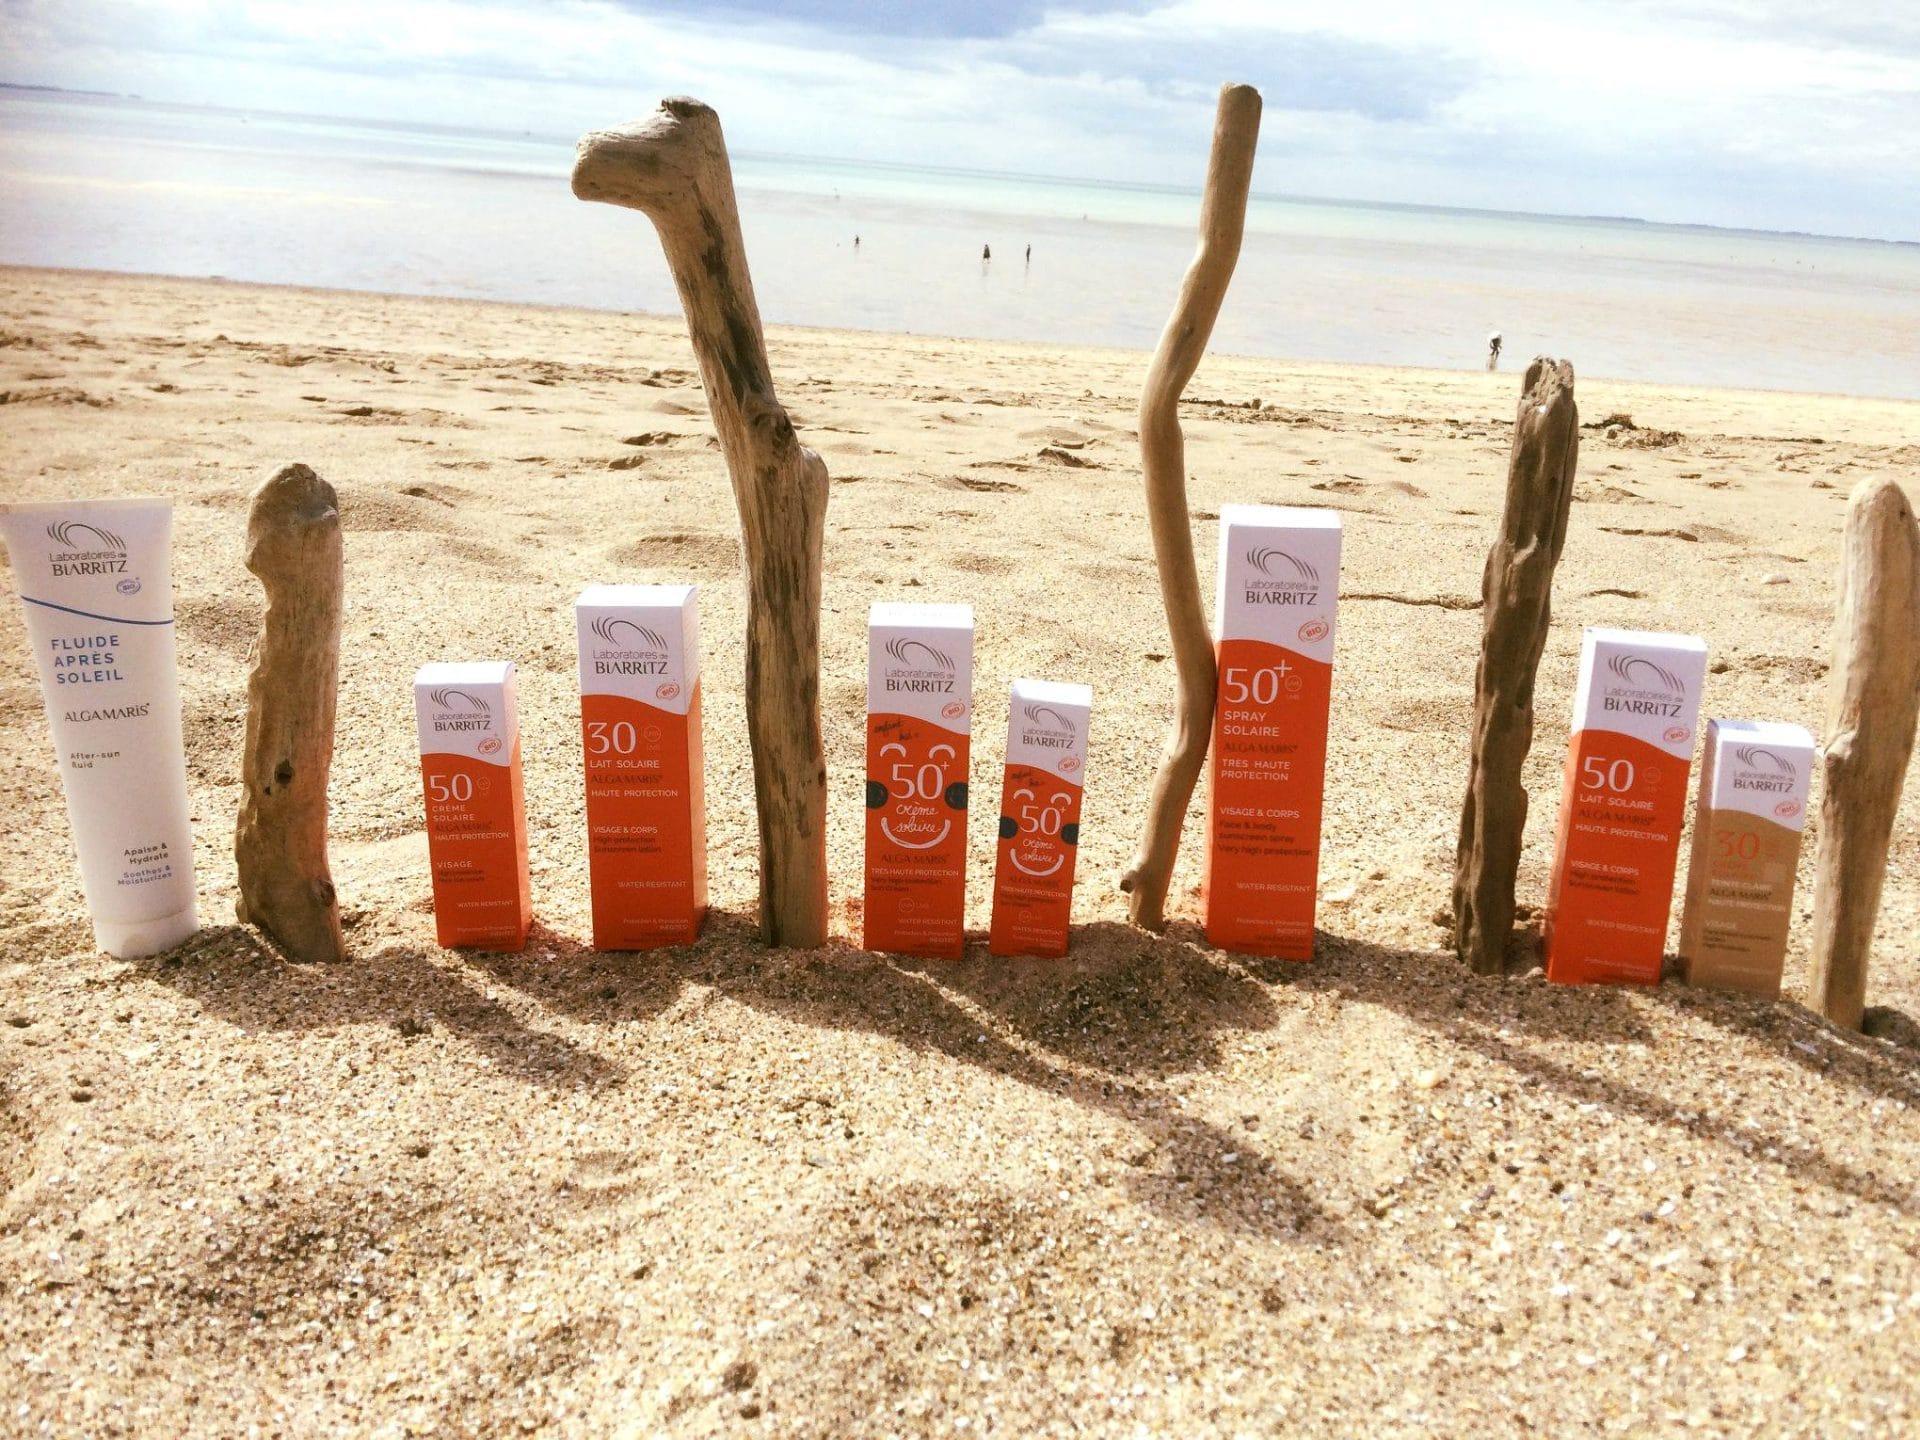 New Tinted Sunscreen Joins Our ALGA MARIS ® Sunscreens